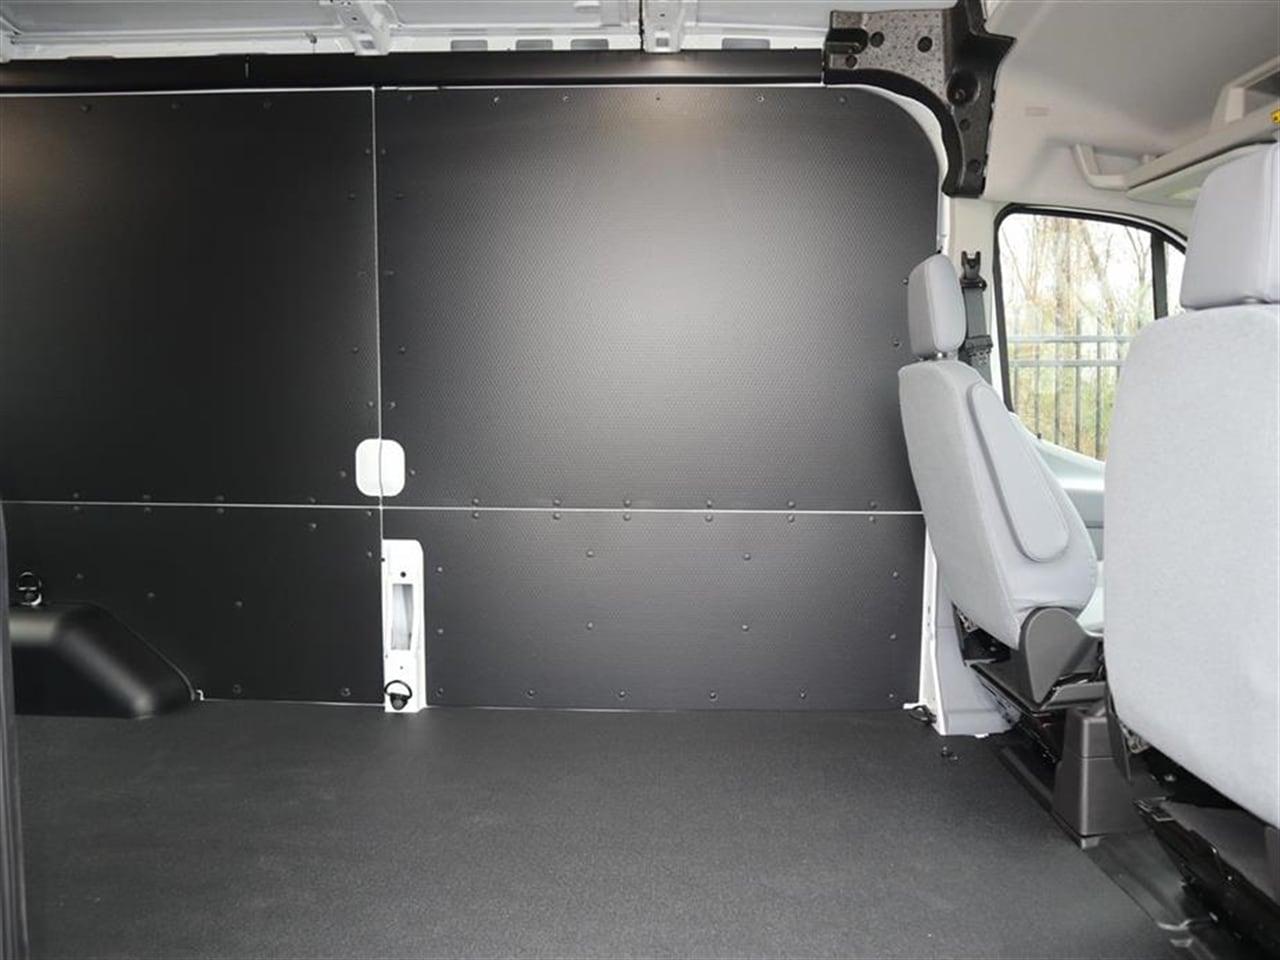 2019 Transit 250 Med Roof 4x2,  Empty Cargo Van #19T0074 - photo 2